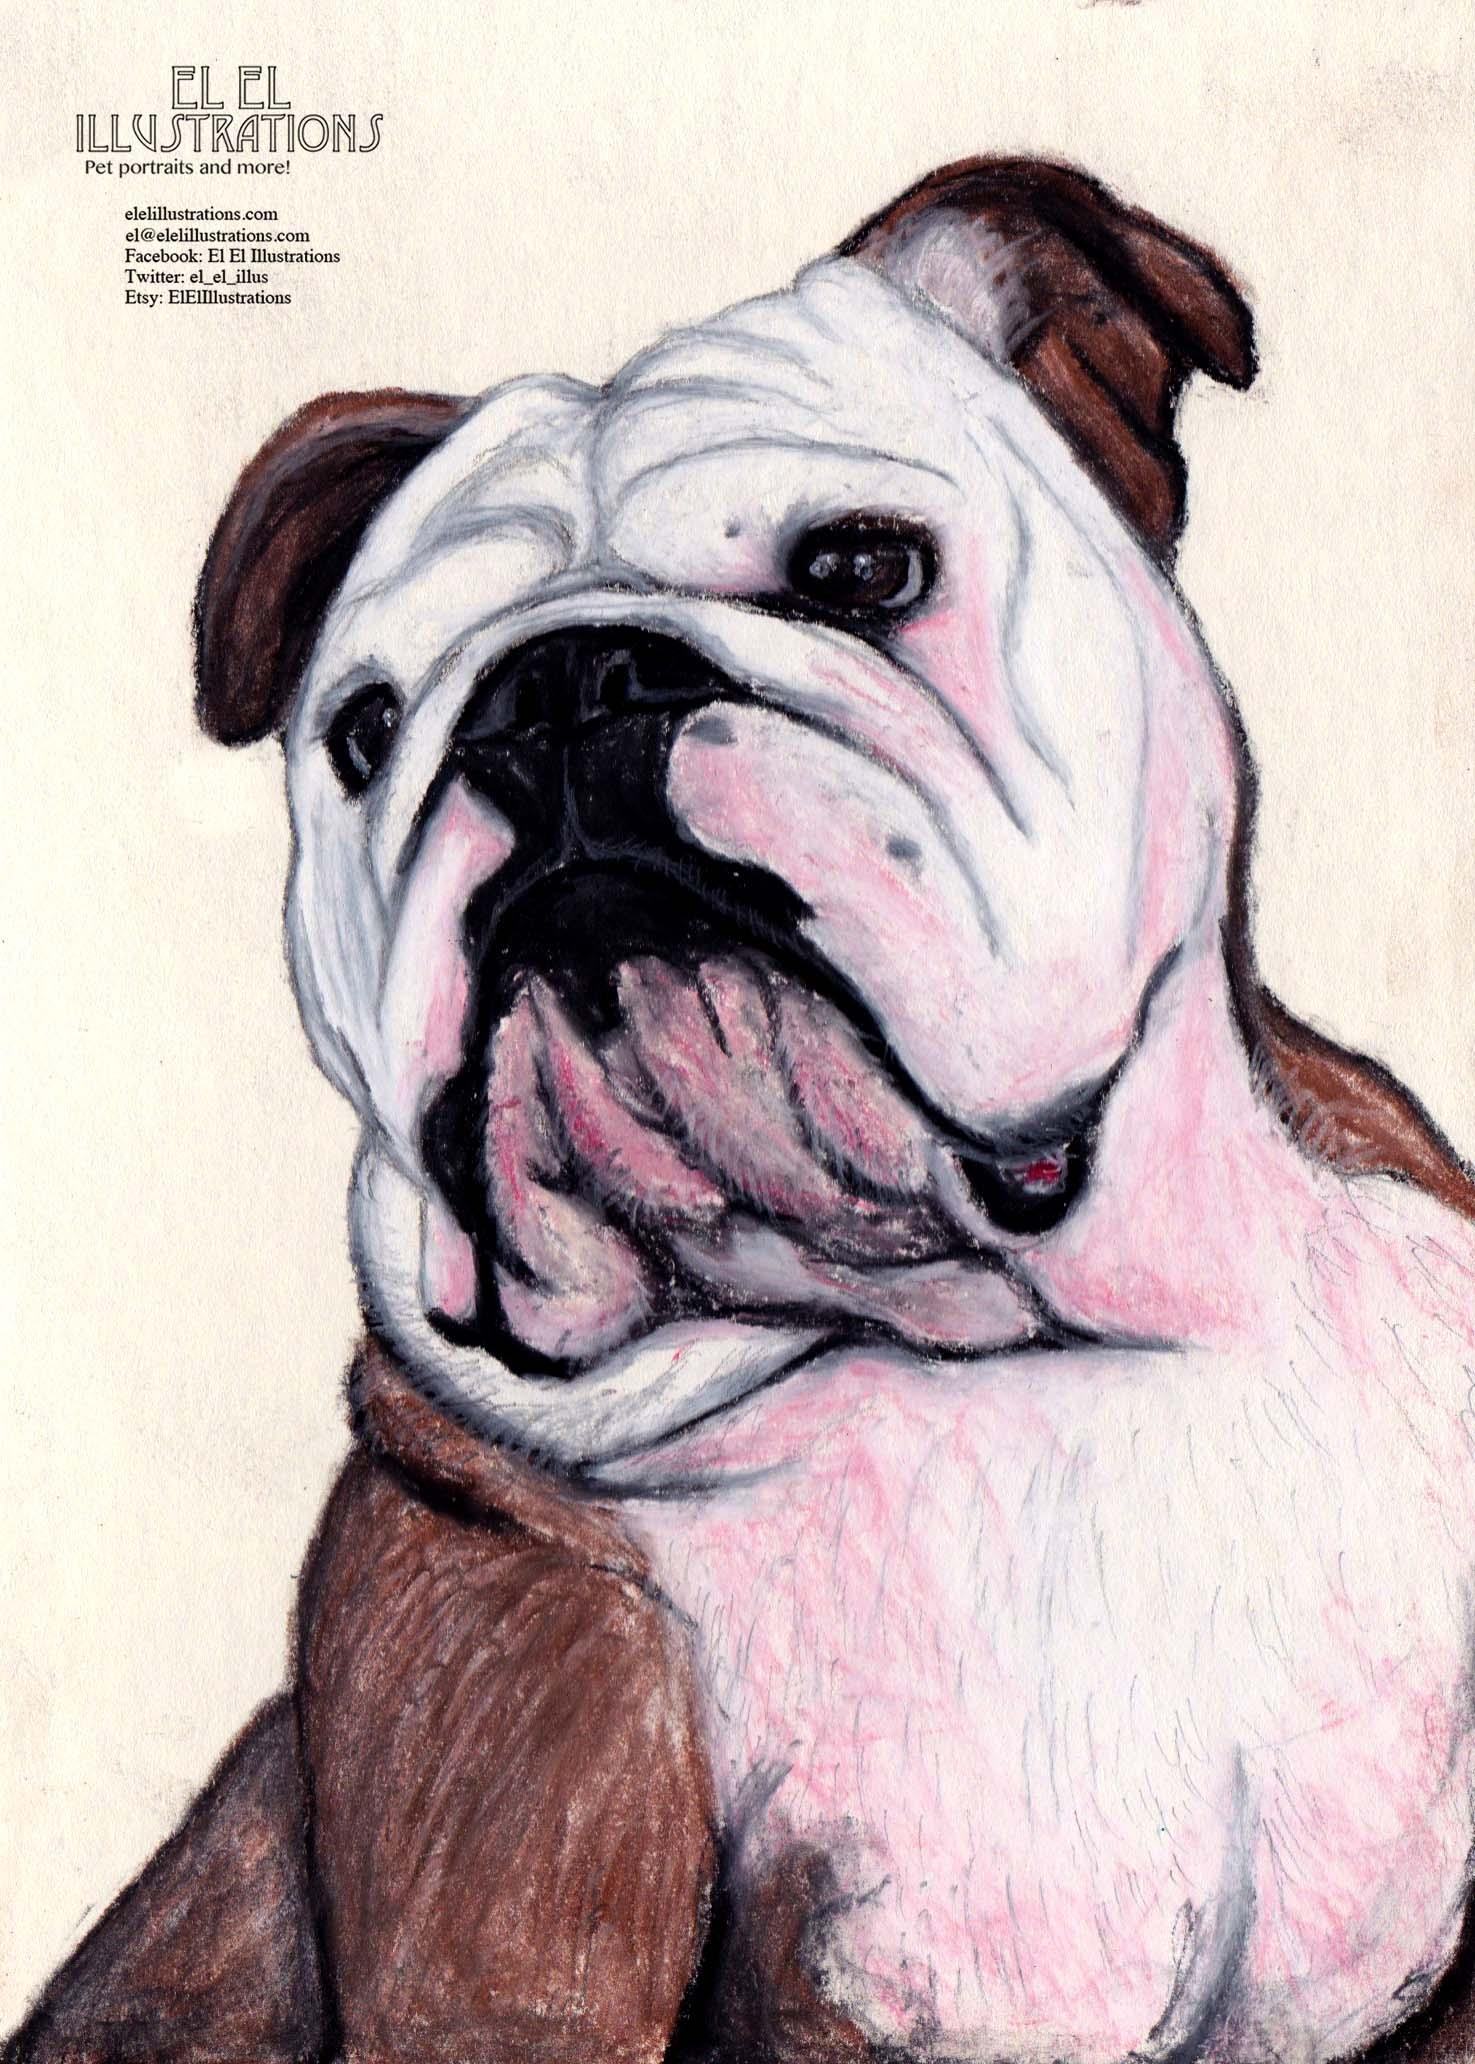 bulldog_scarlett_wm.jpg